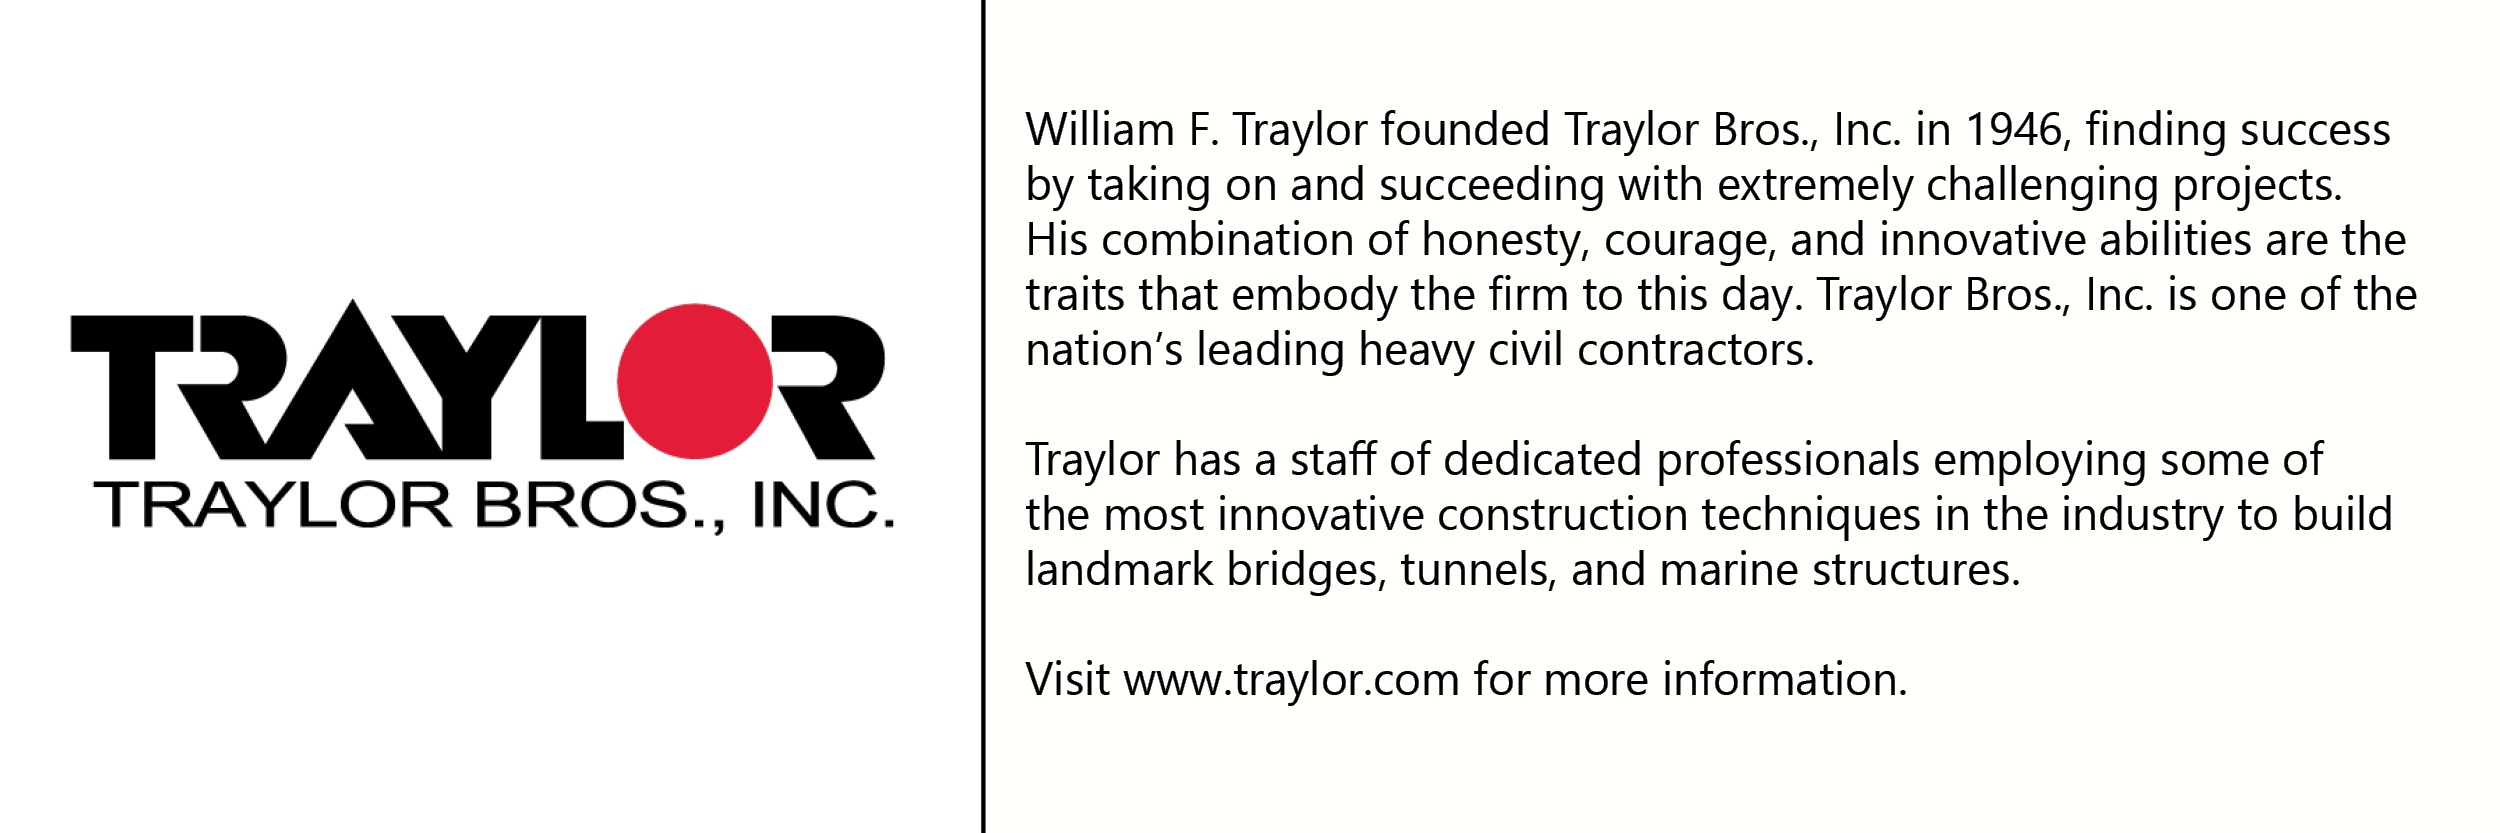 Traylor Bros.  logo with description of company